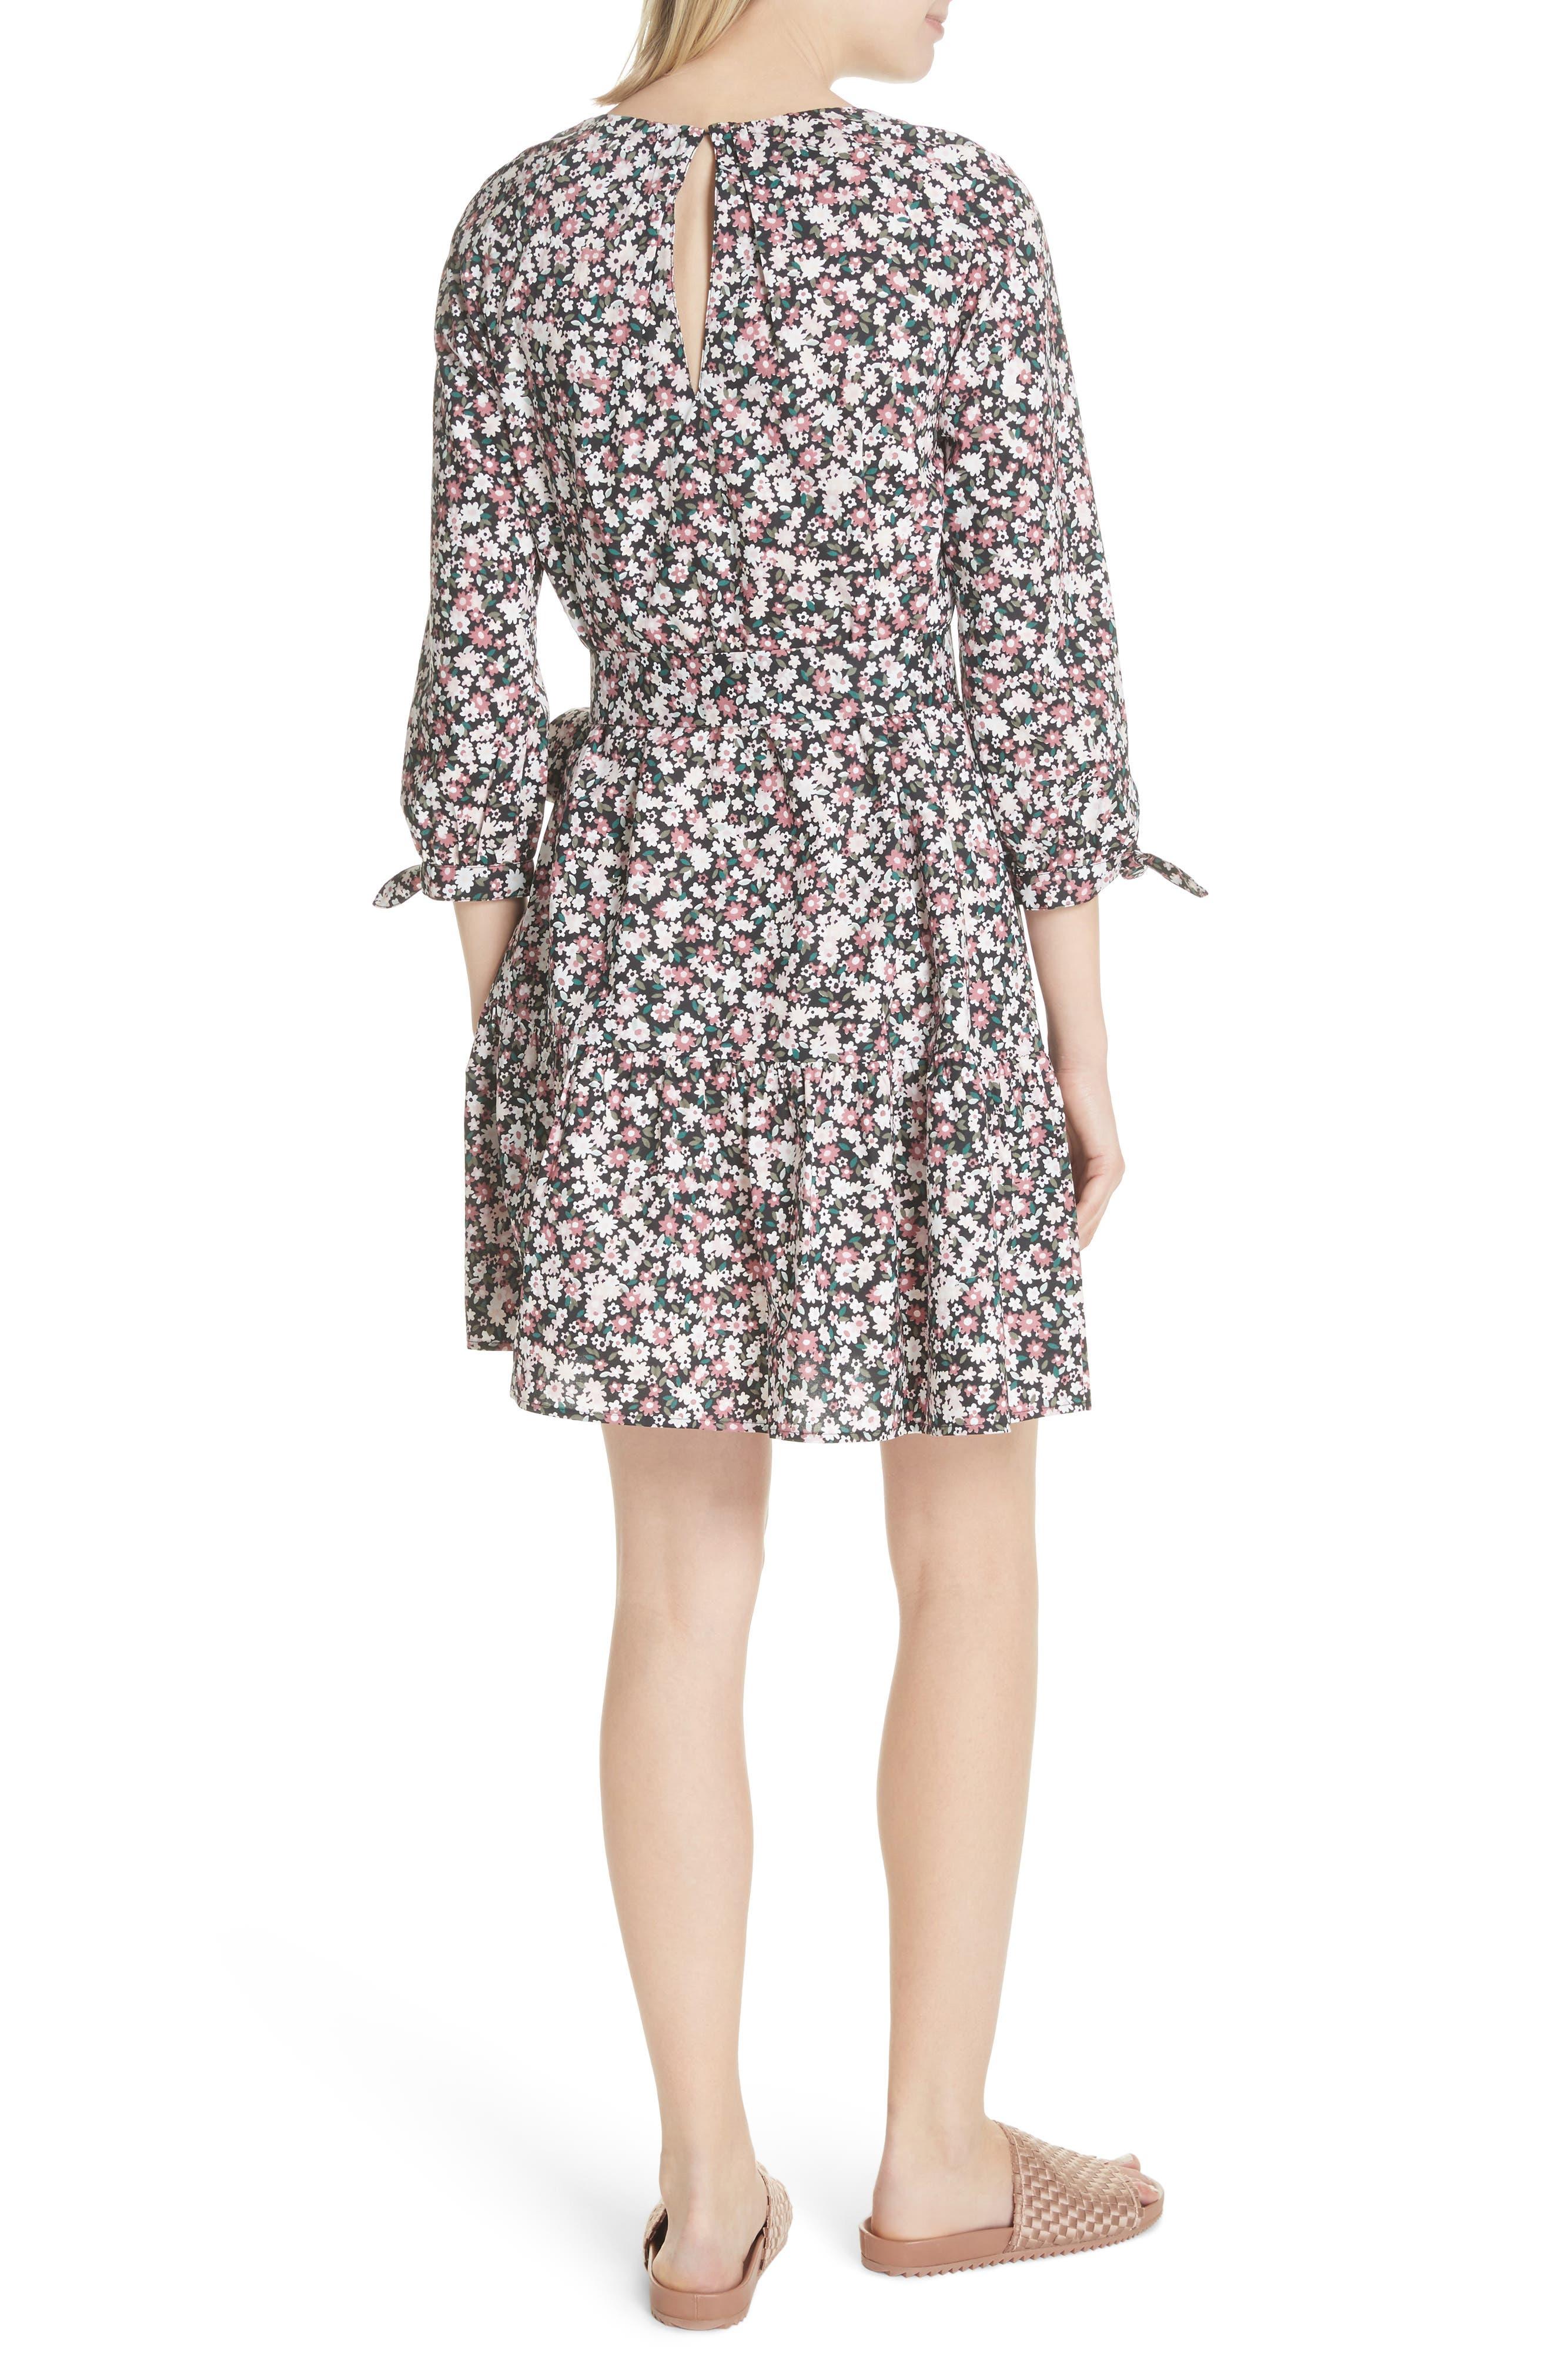 wildflower poplin dress,                             Alternate thumbnail 2, color,